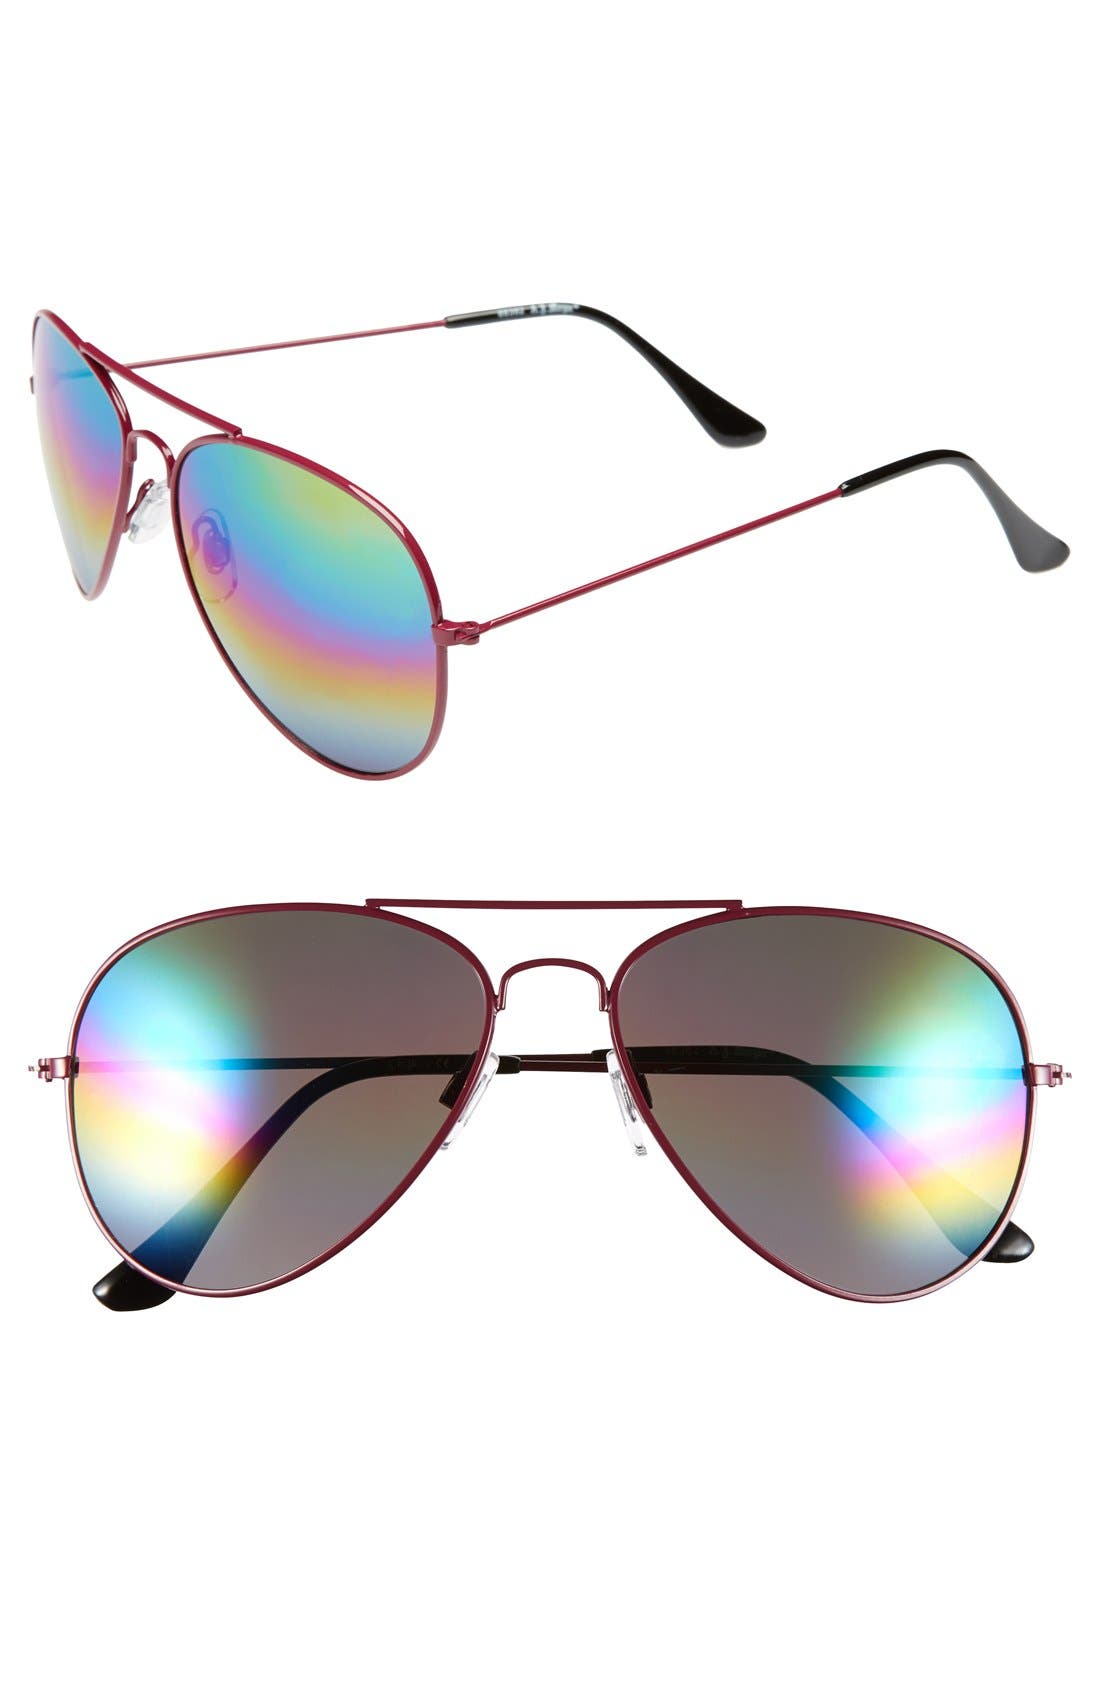 Alternate Image 1 Selected - A.J. Morgan 'Sunset' 57mm Aviator Sunglasses